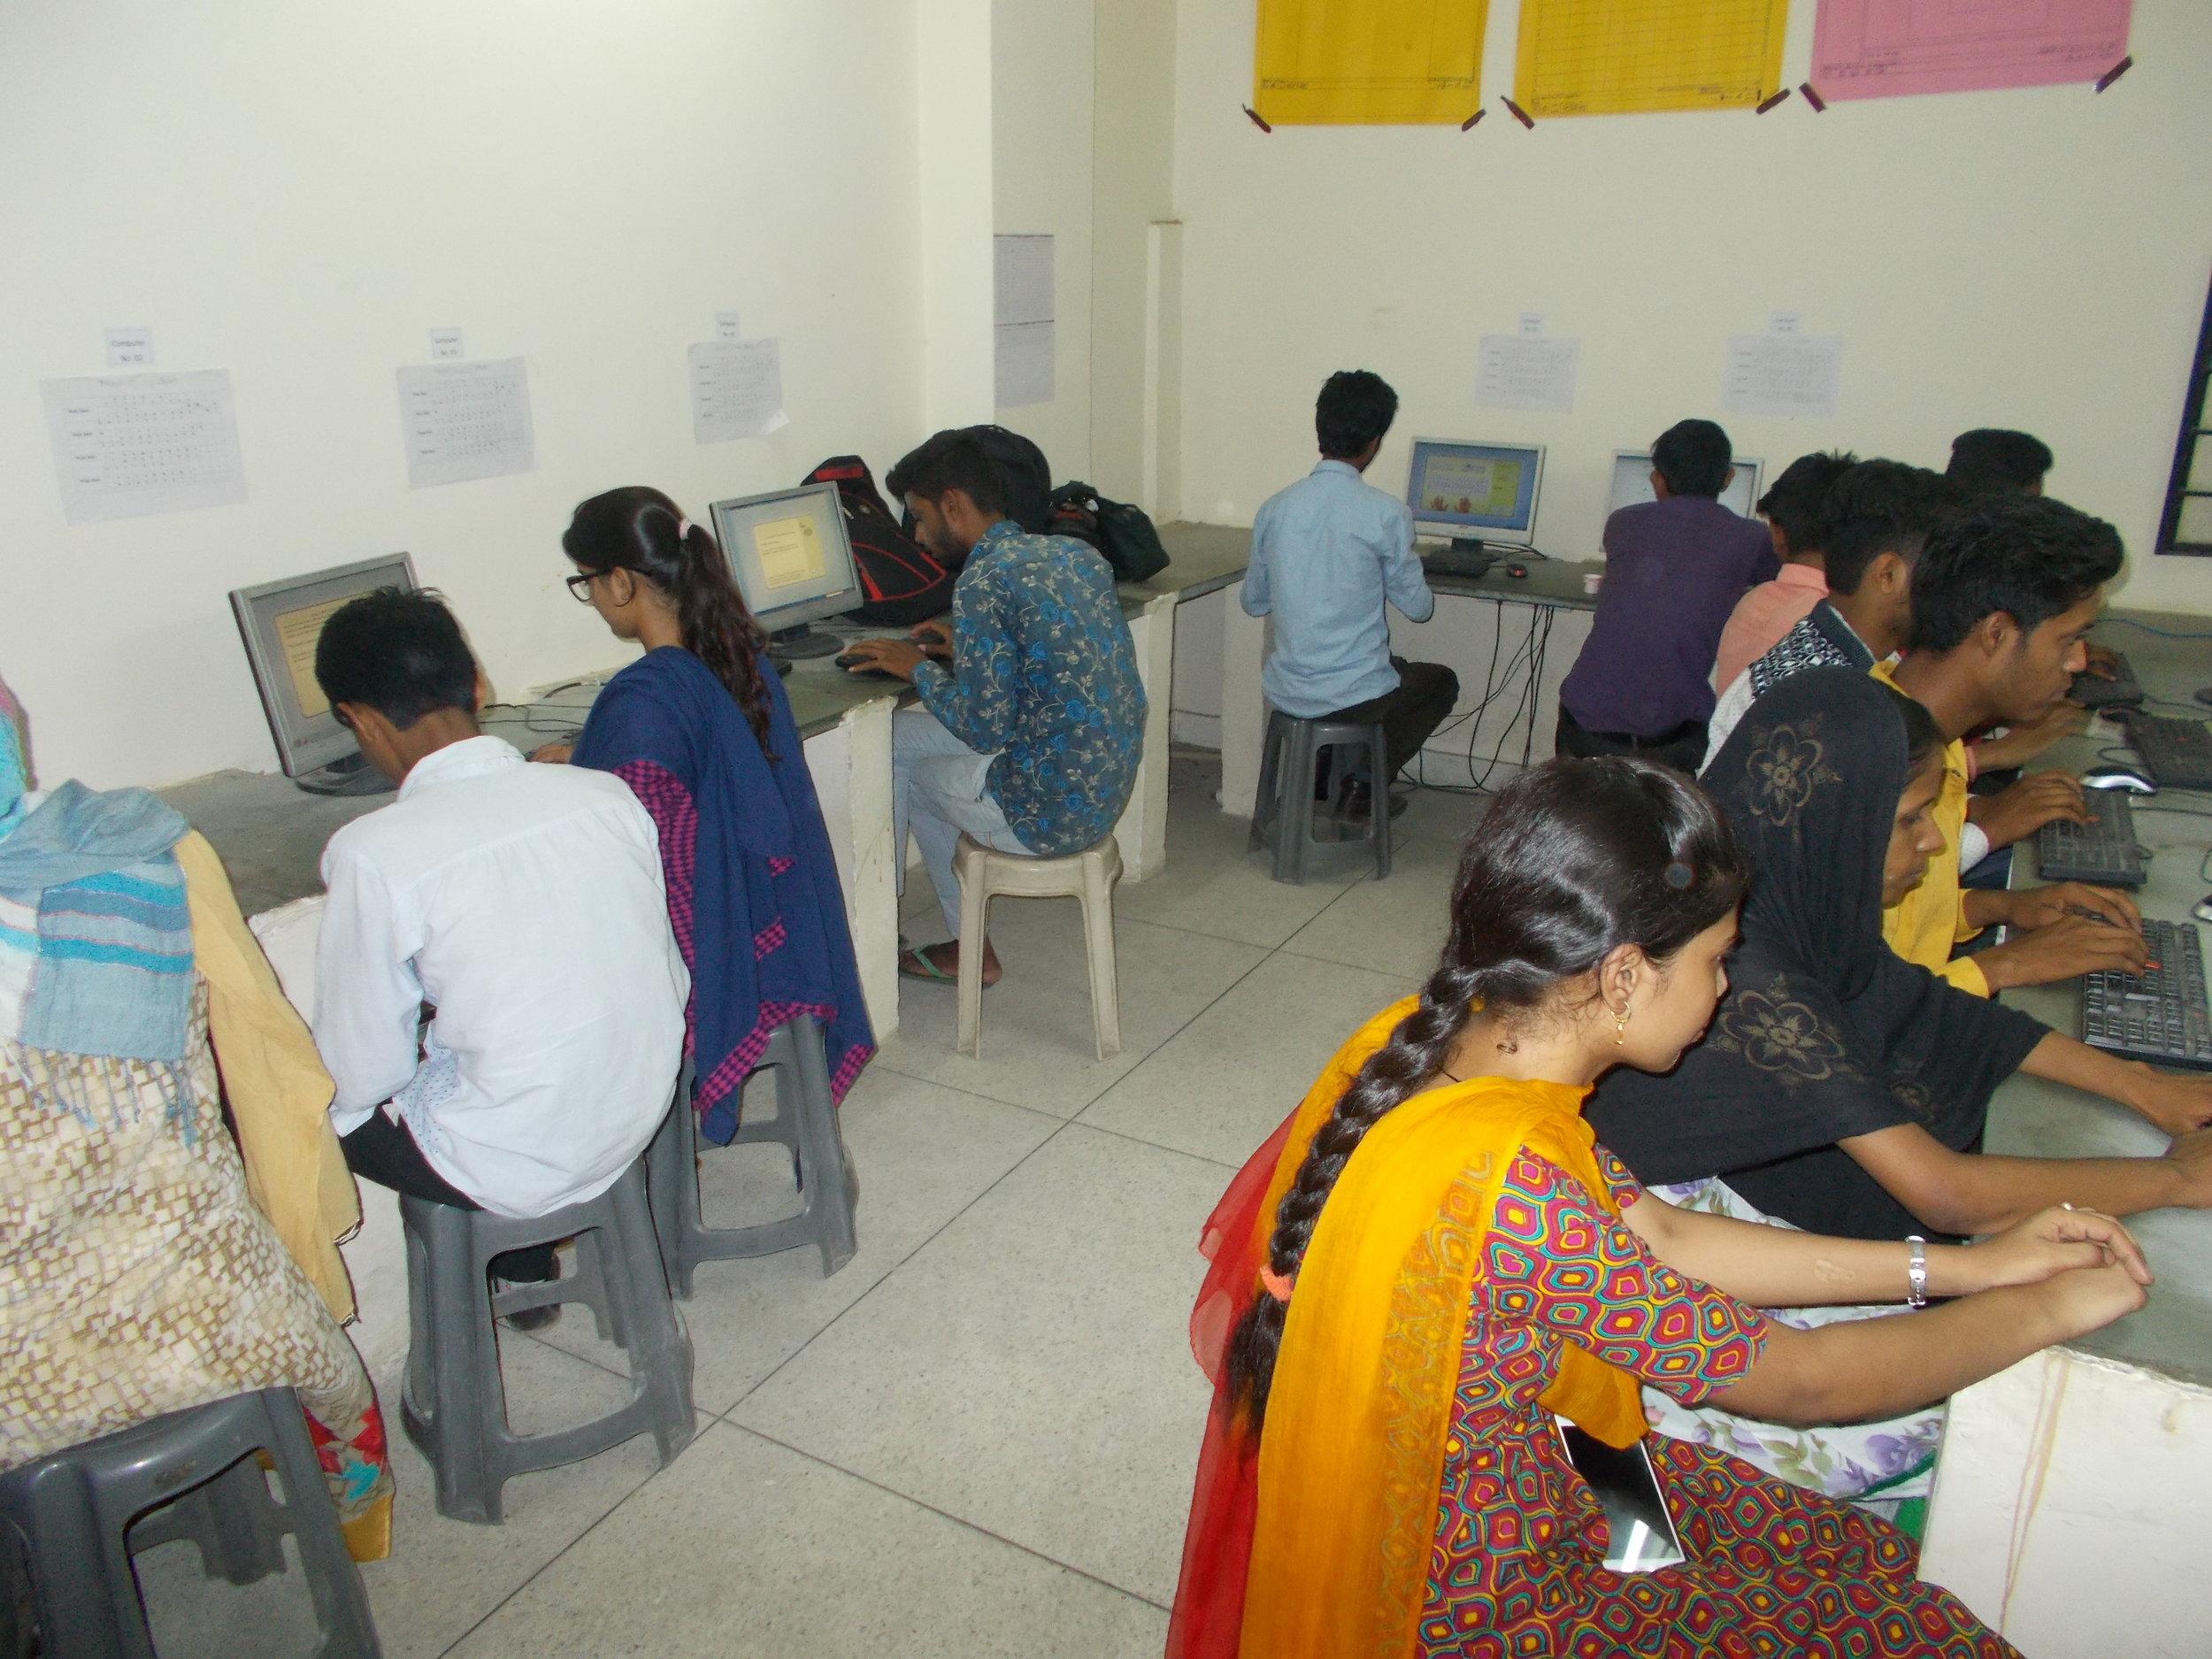 Students learning computer skills through UpSkill's technology-based vocational training platform.